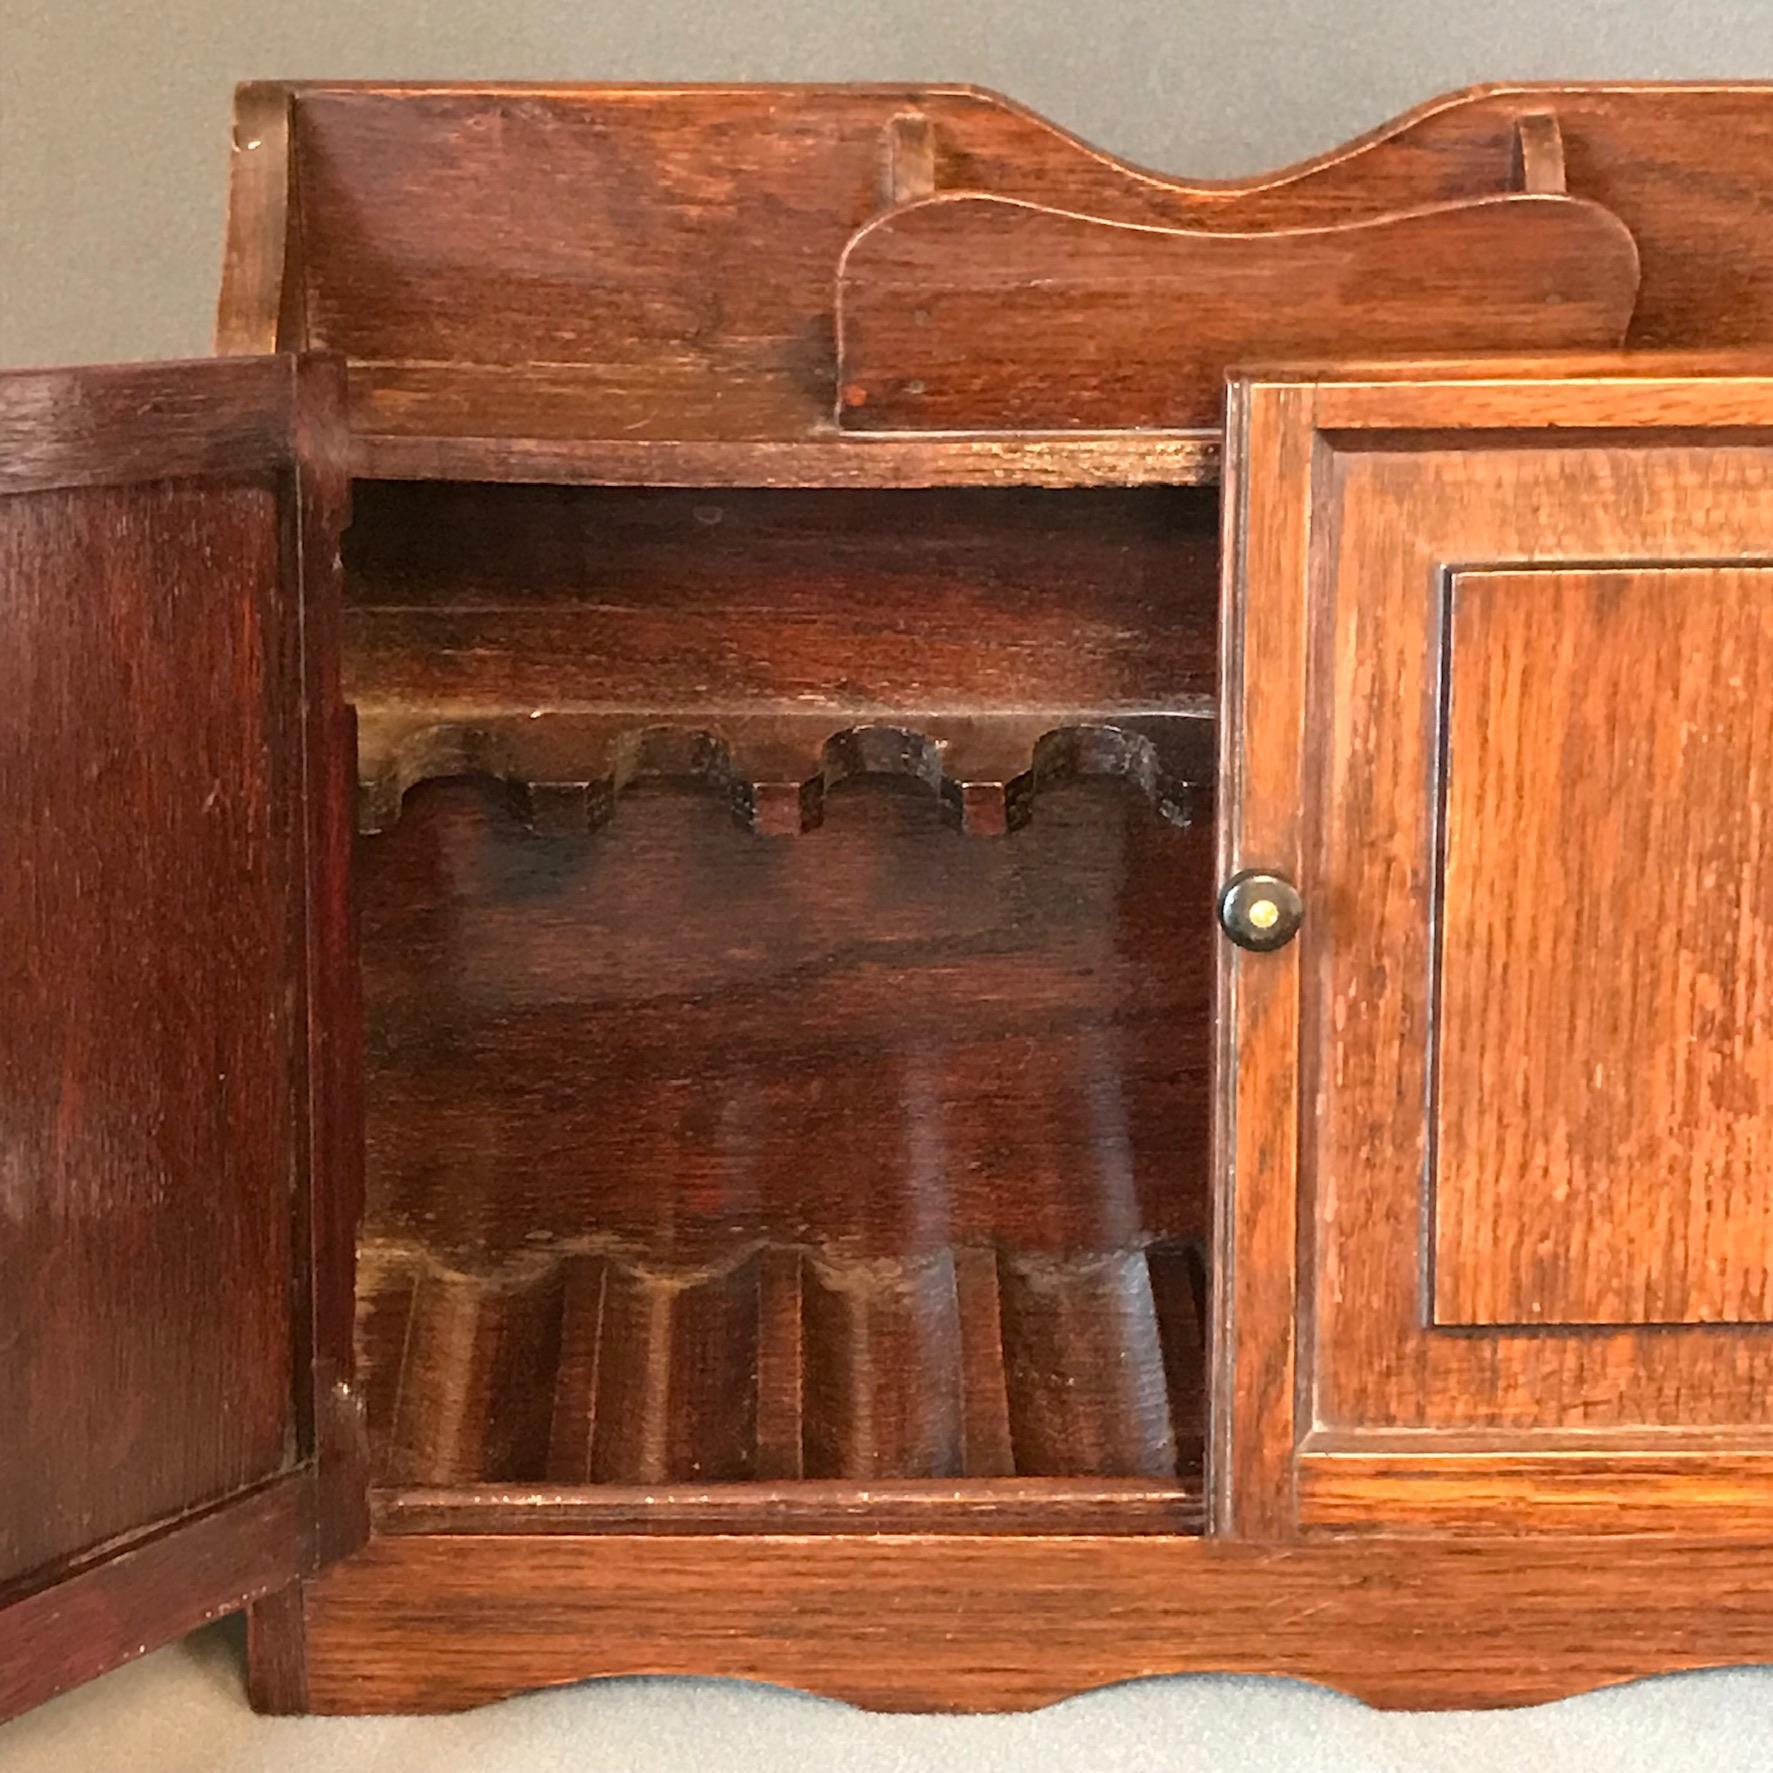 Late 1800s Oak Pipe Smokers Cabinet - Tantalus Barrels